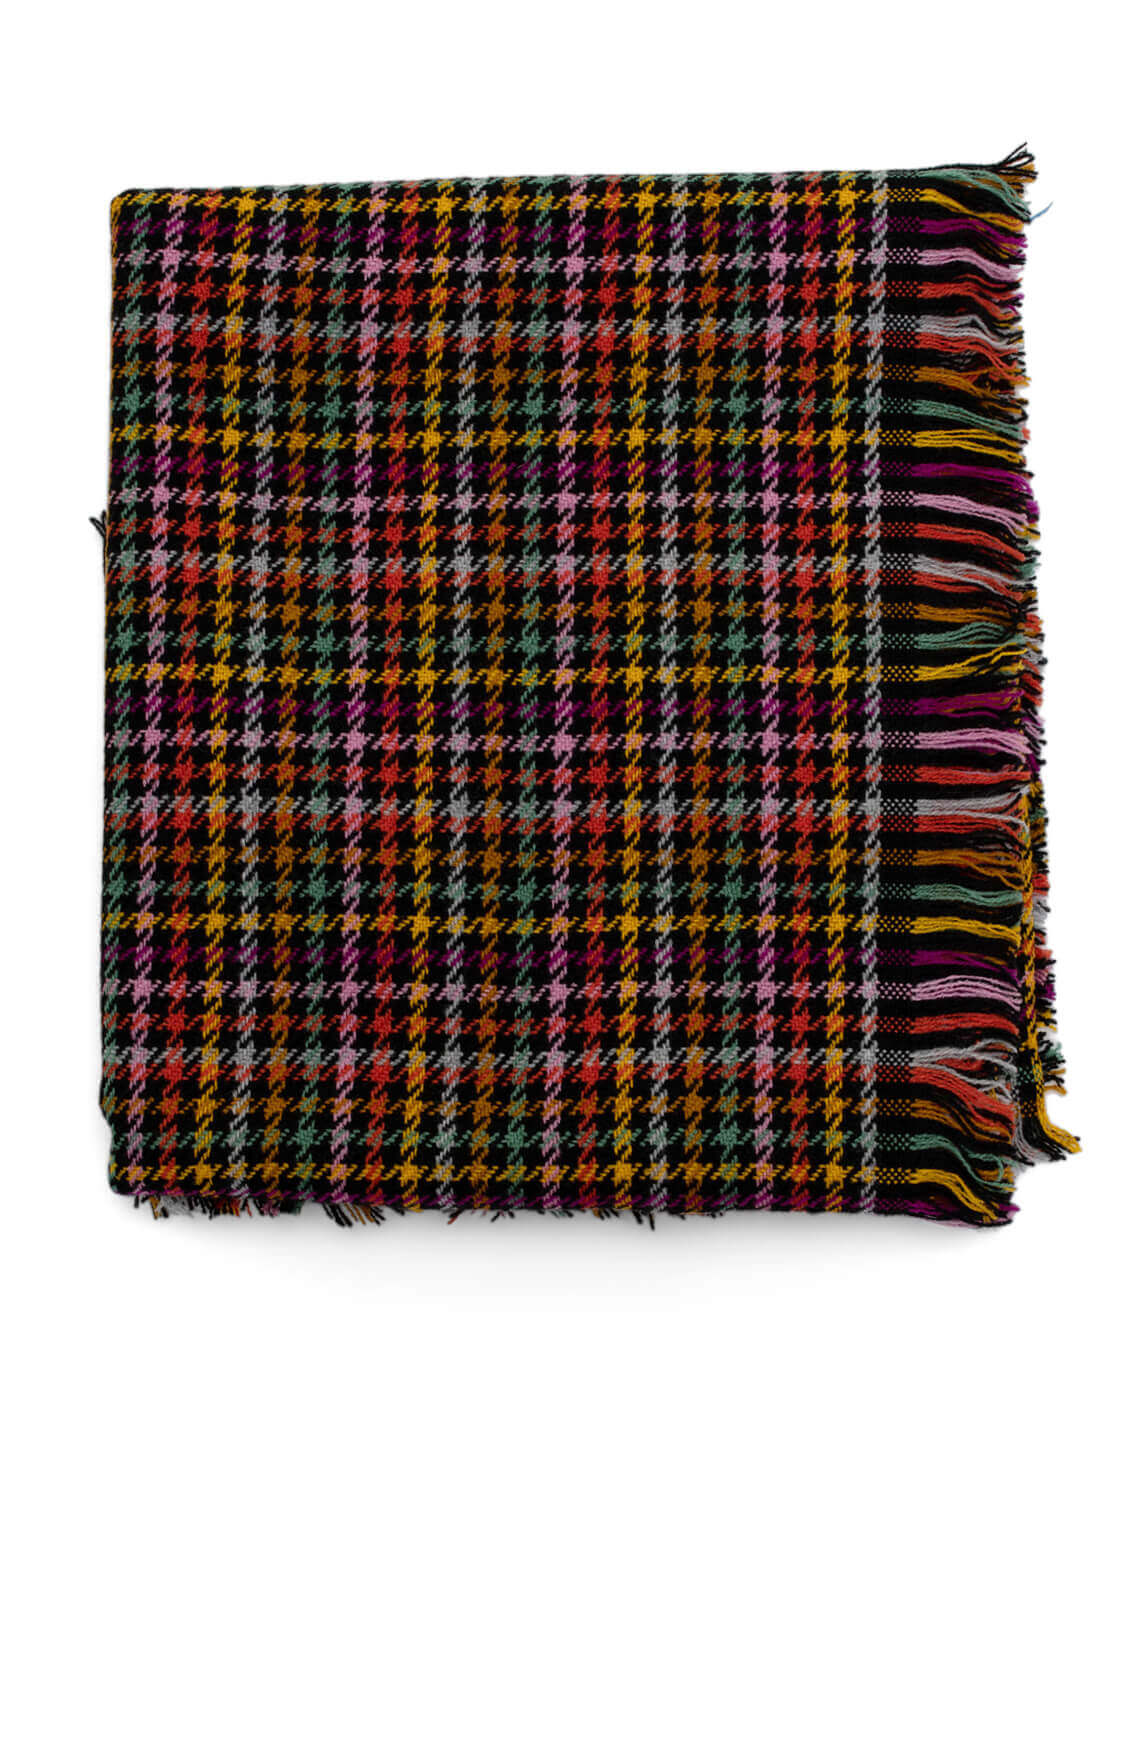 Codello Dames Pied-de-poule shawl zwart